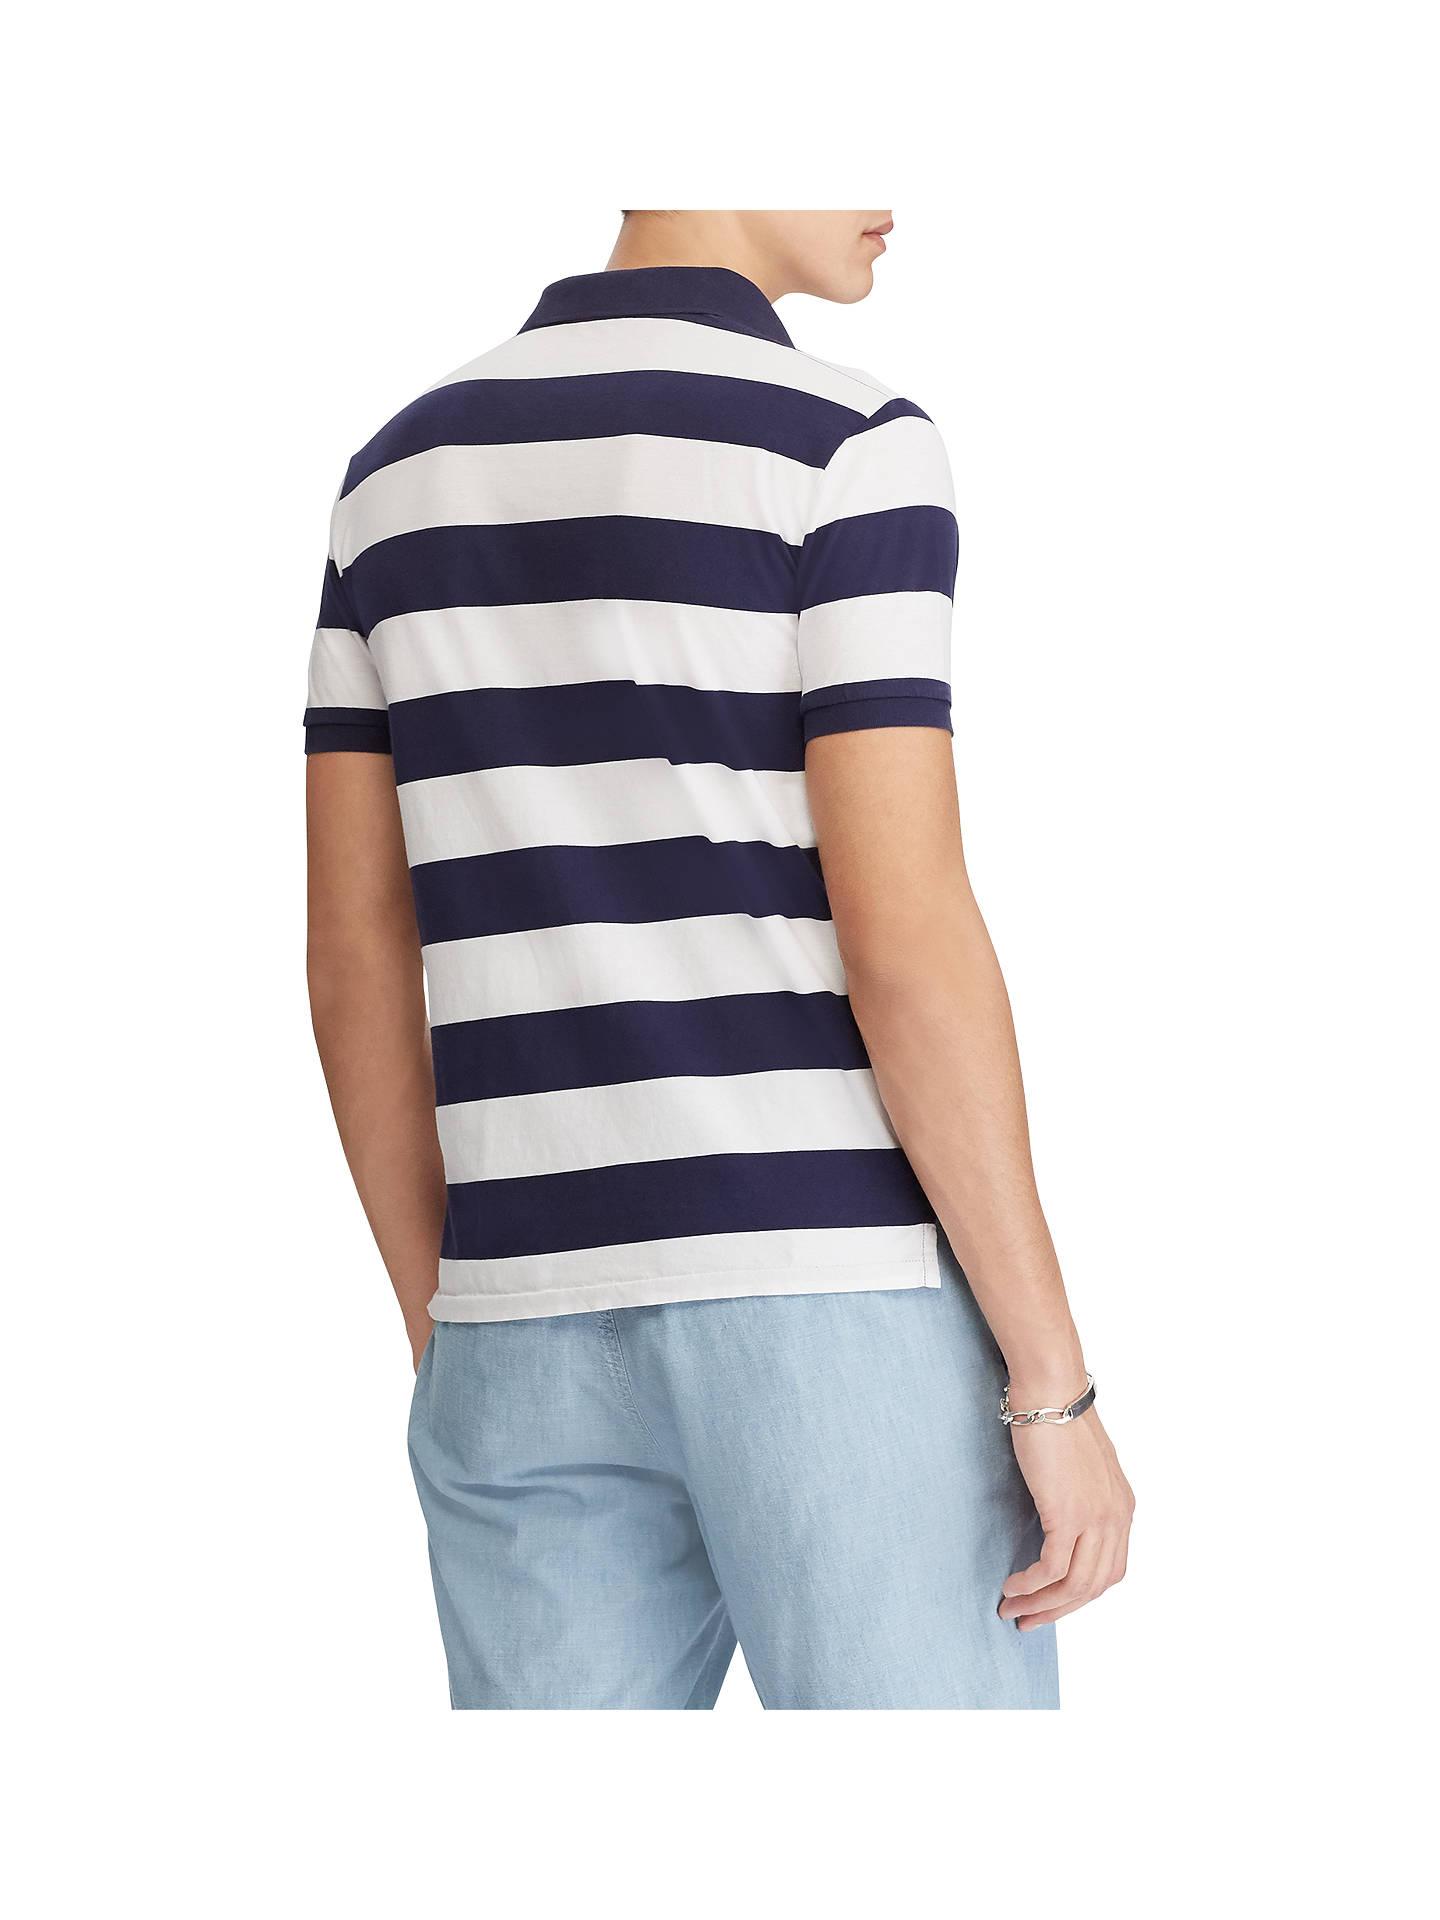 bd5a66bc3 ... Buy Polo Ralph Lauren Custom Slim Fit Stripe Polo Shirt